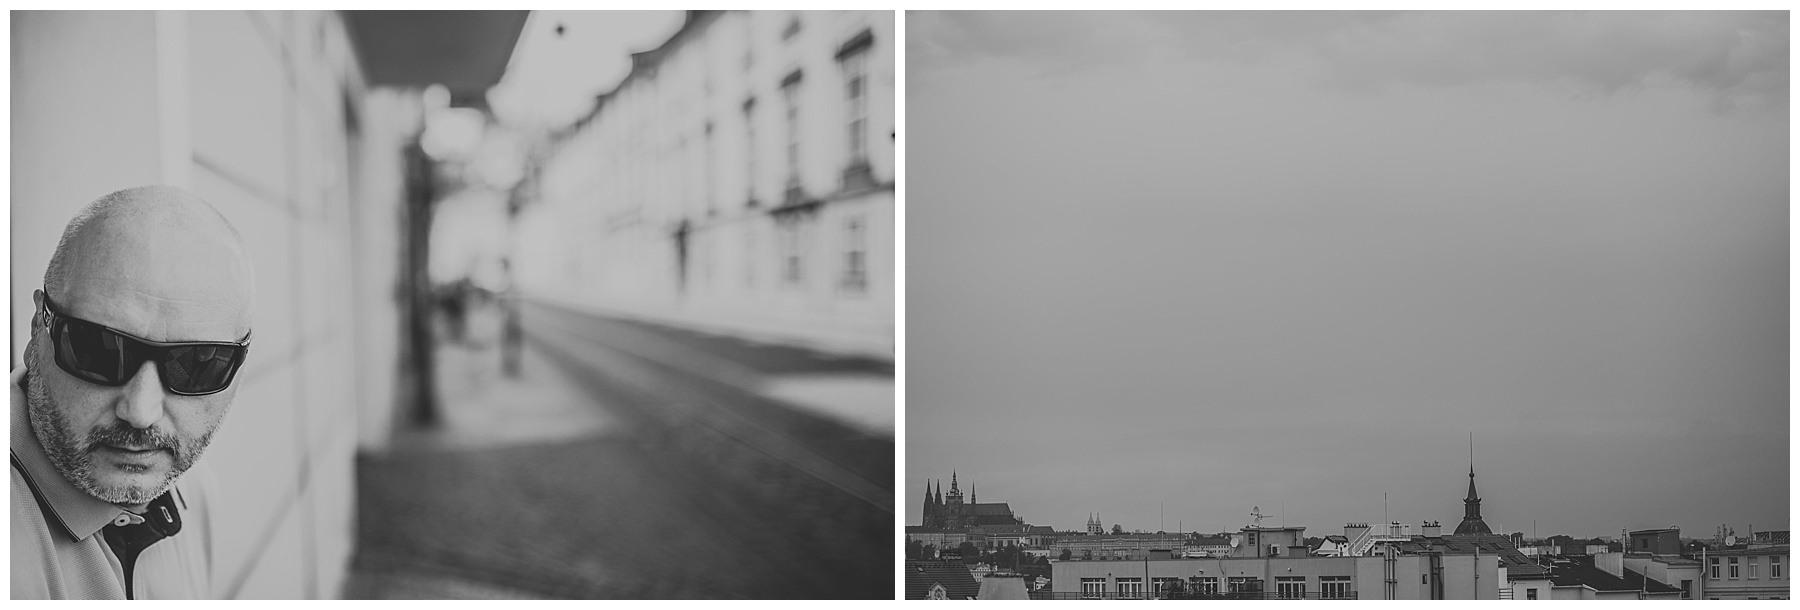 Praga_czechy_fotografia_2017-07-14_0013.jpg